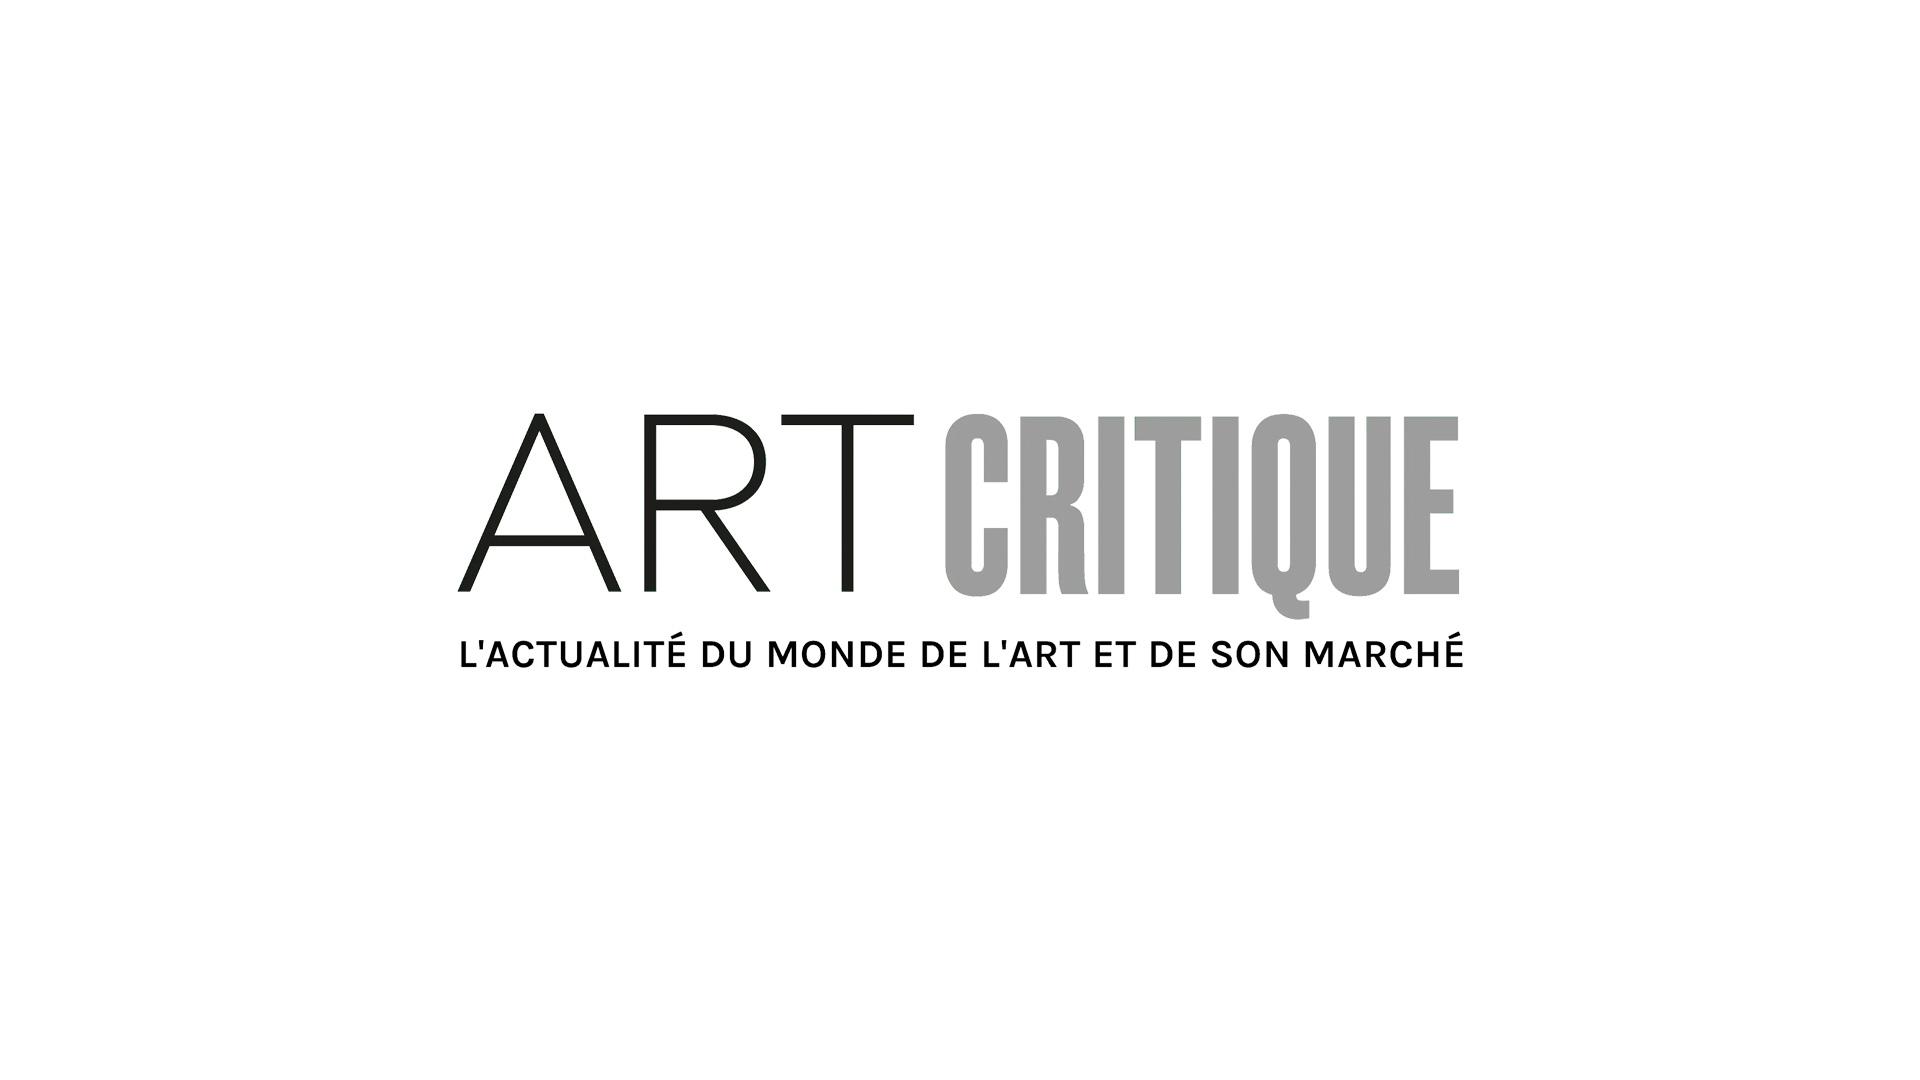 Dessau opens museum honouring the Bauhaus school